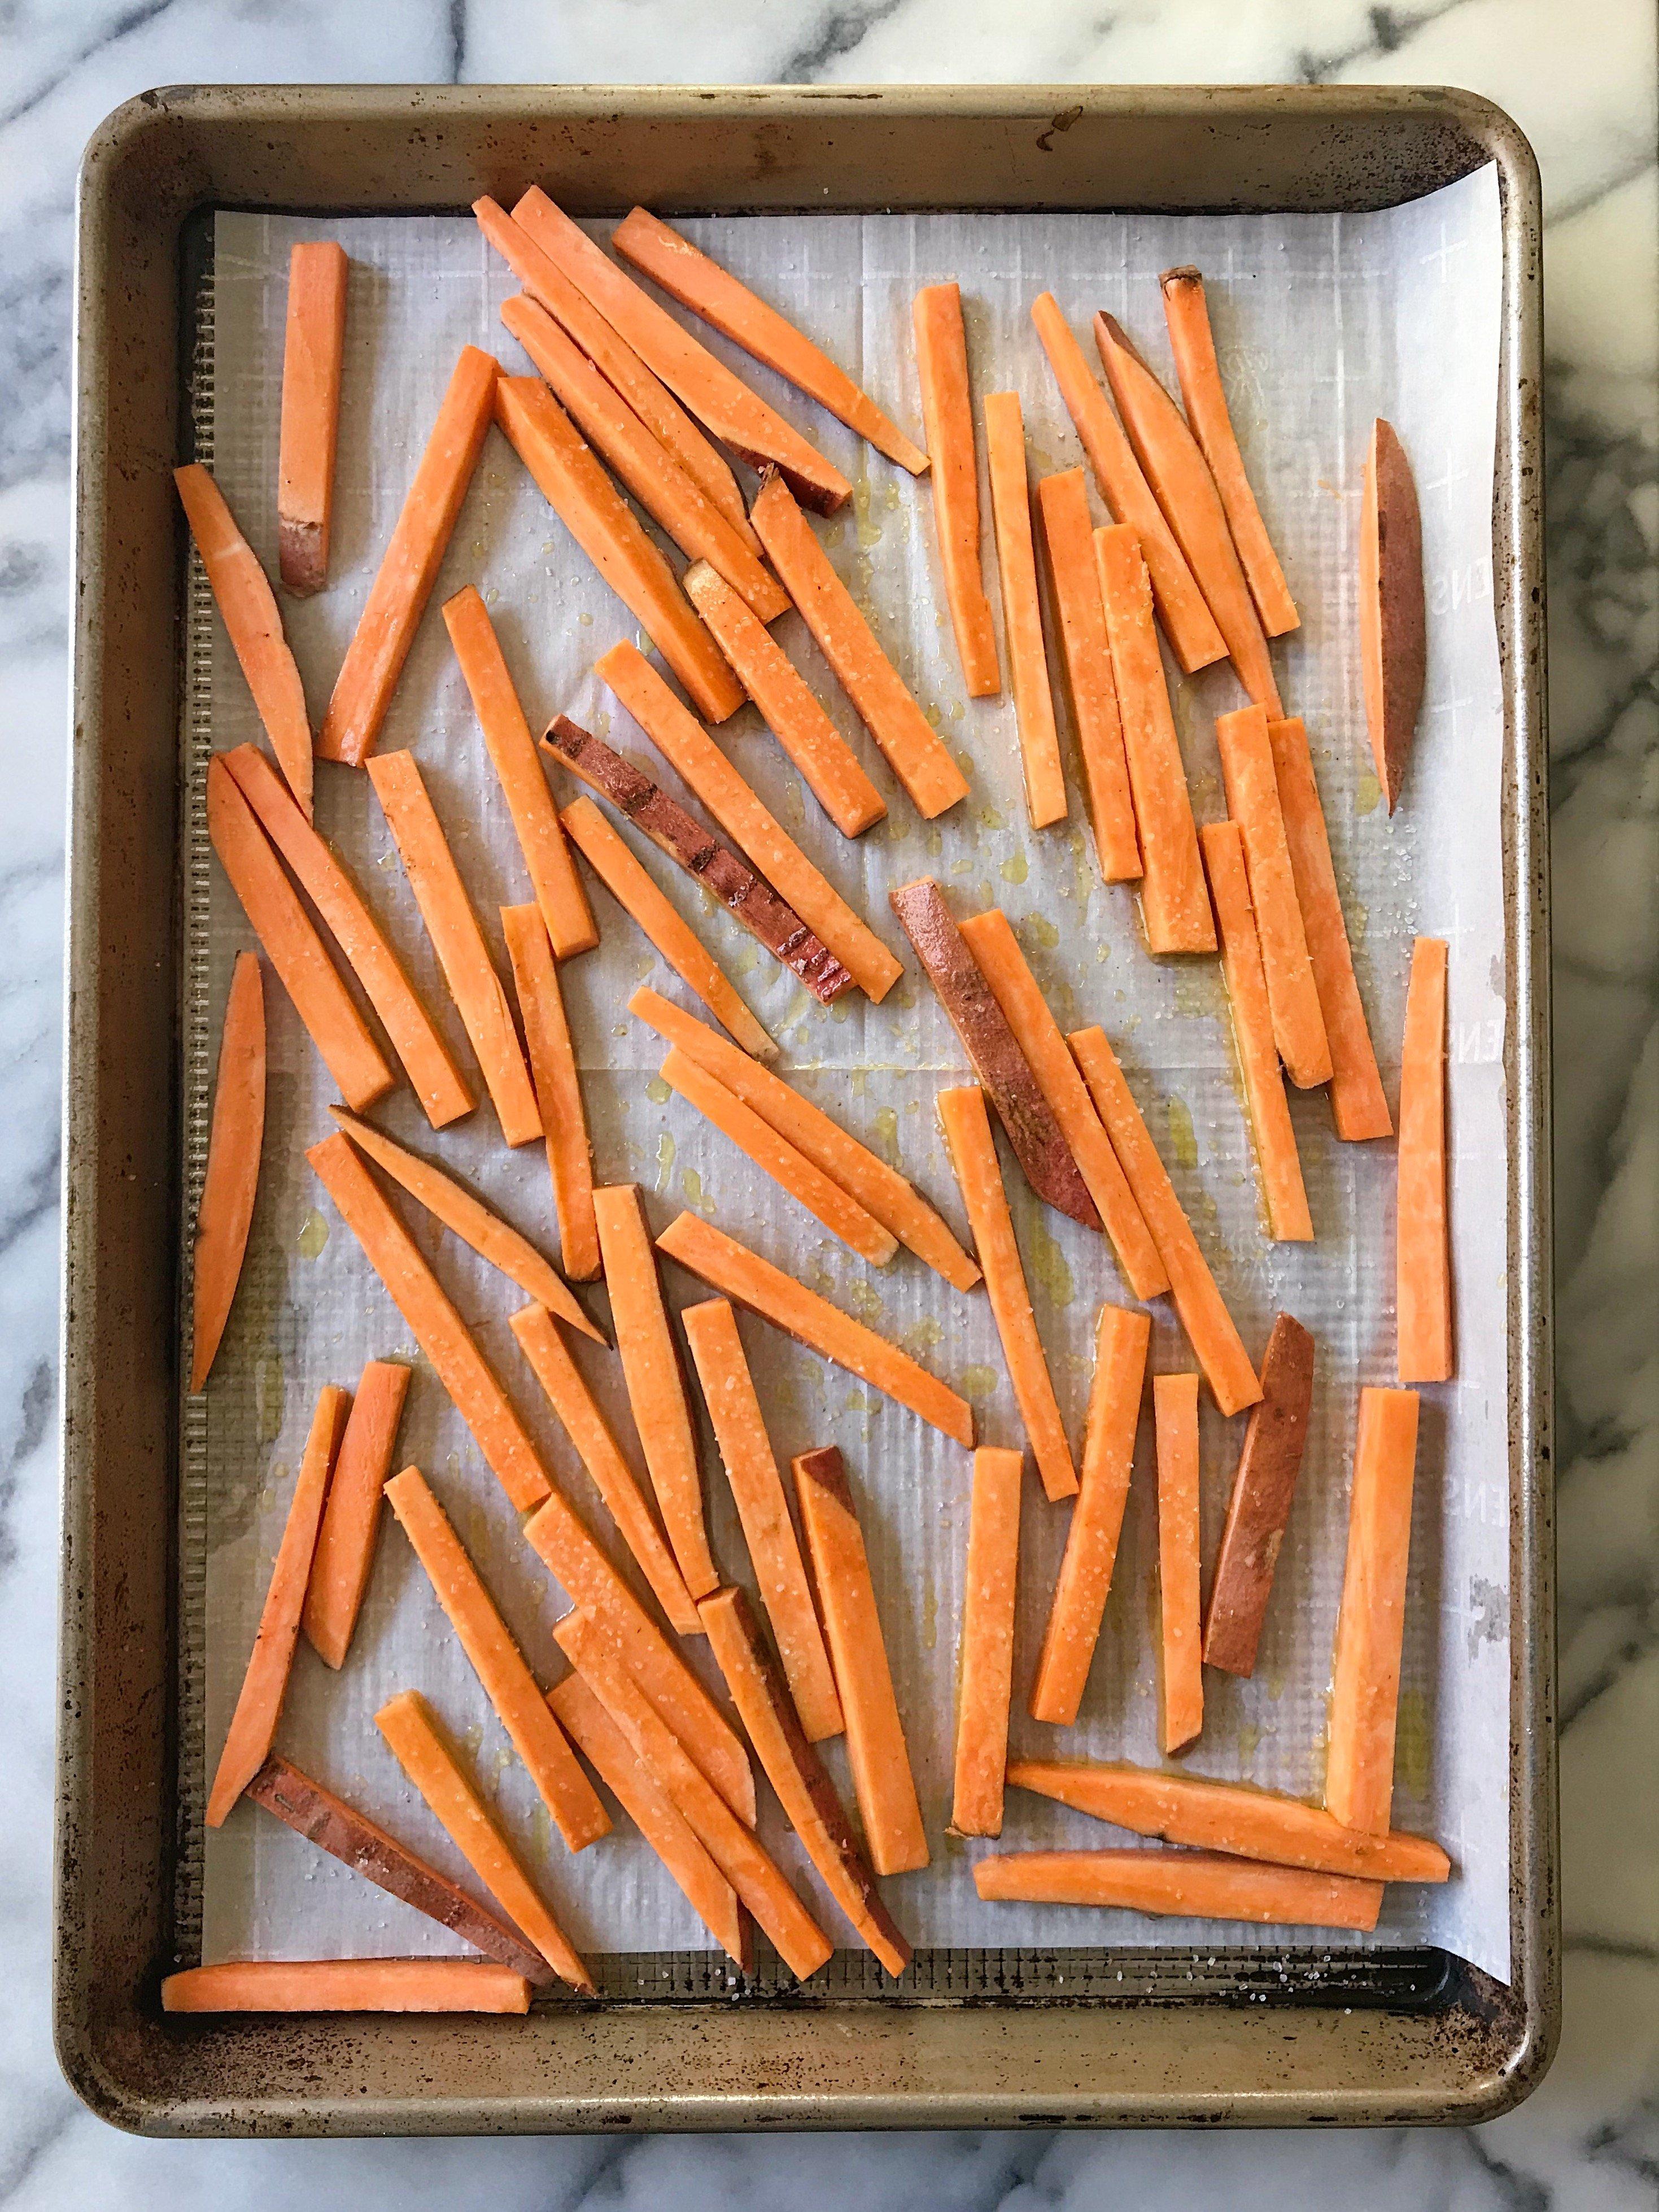 Sweet Potato fries gluten free #glutenfreerecipes www.healthygffamily.com